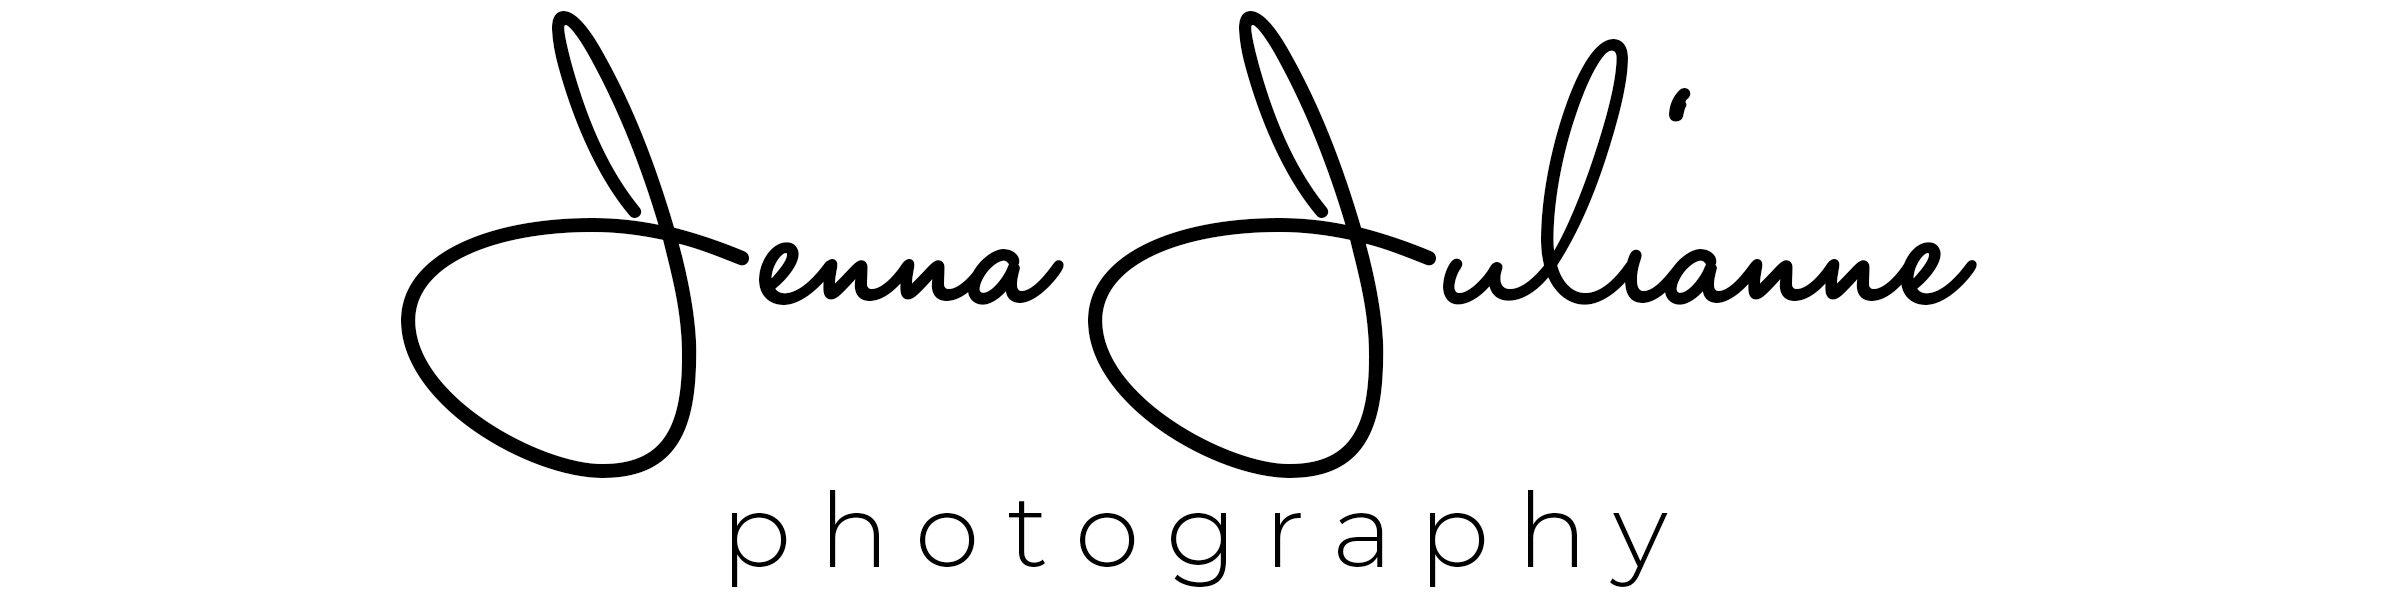 Jenna Julianne Photography